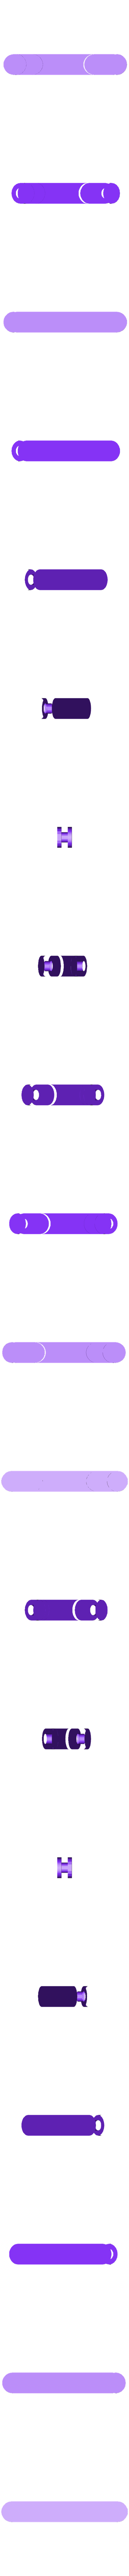 6cm_Strap_Pegs.stl Download free STL file Flexible Filament Bikini Top and Bottom • 3D printable design, SexyCyborg